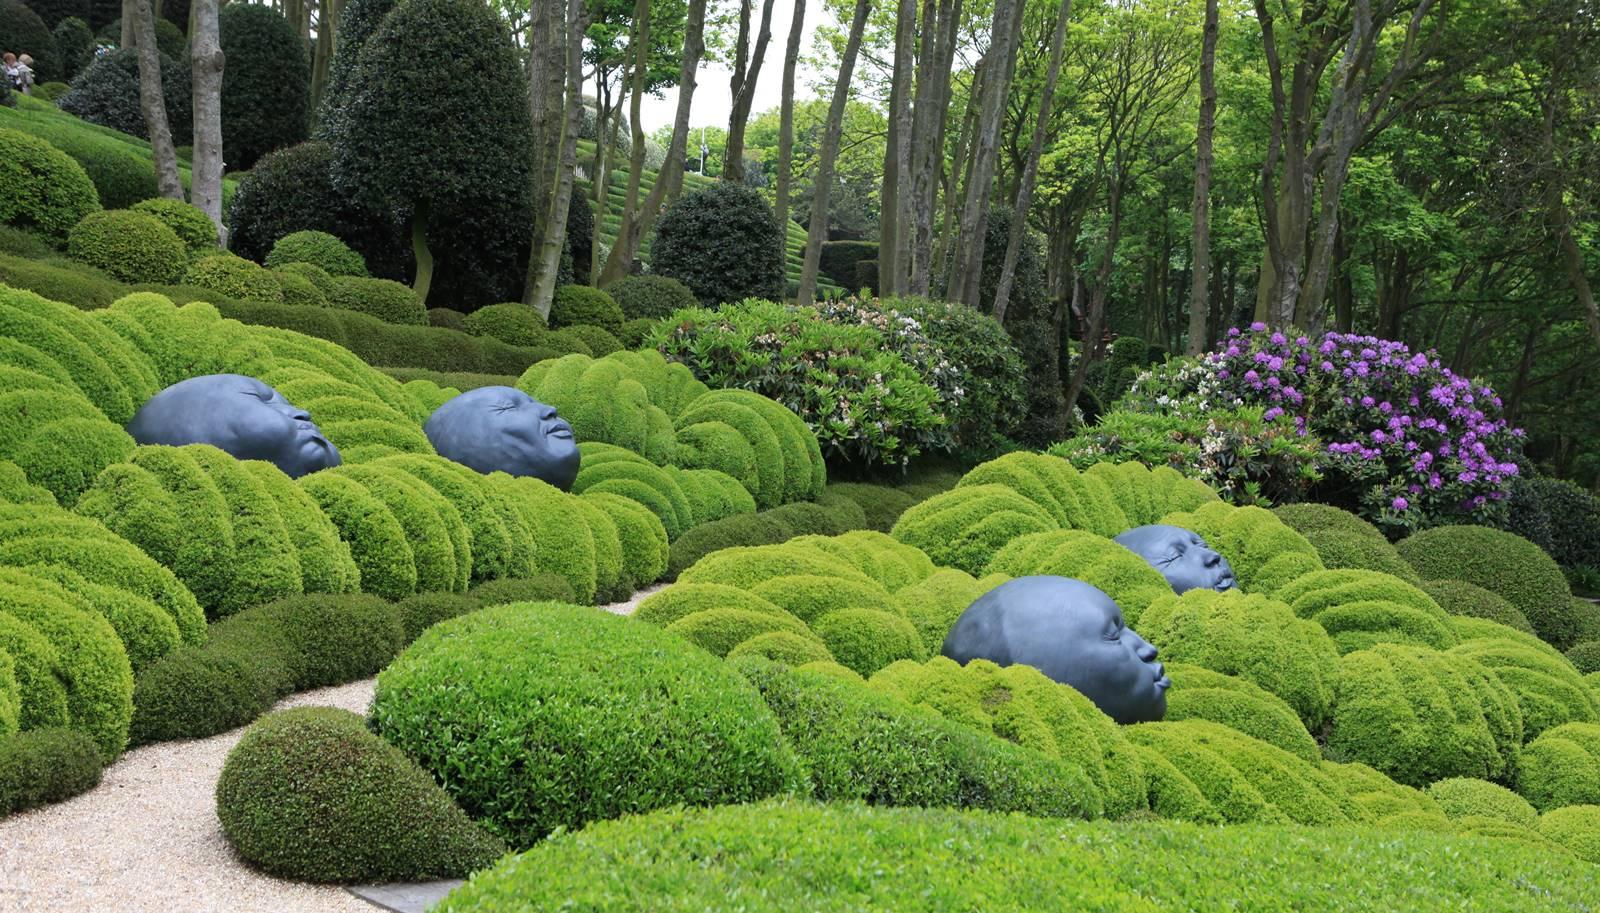 Jardin d'Etretat en Seine-Maritime